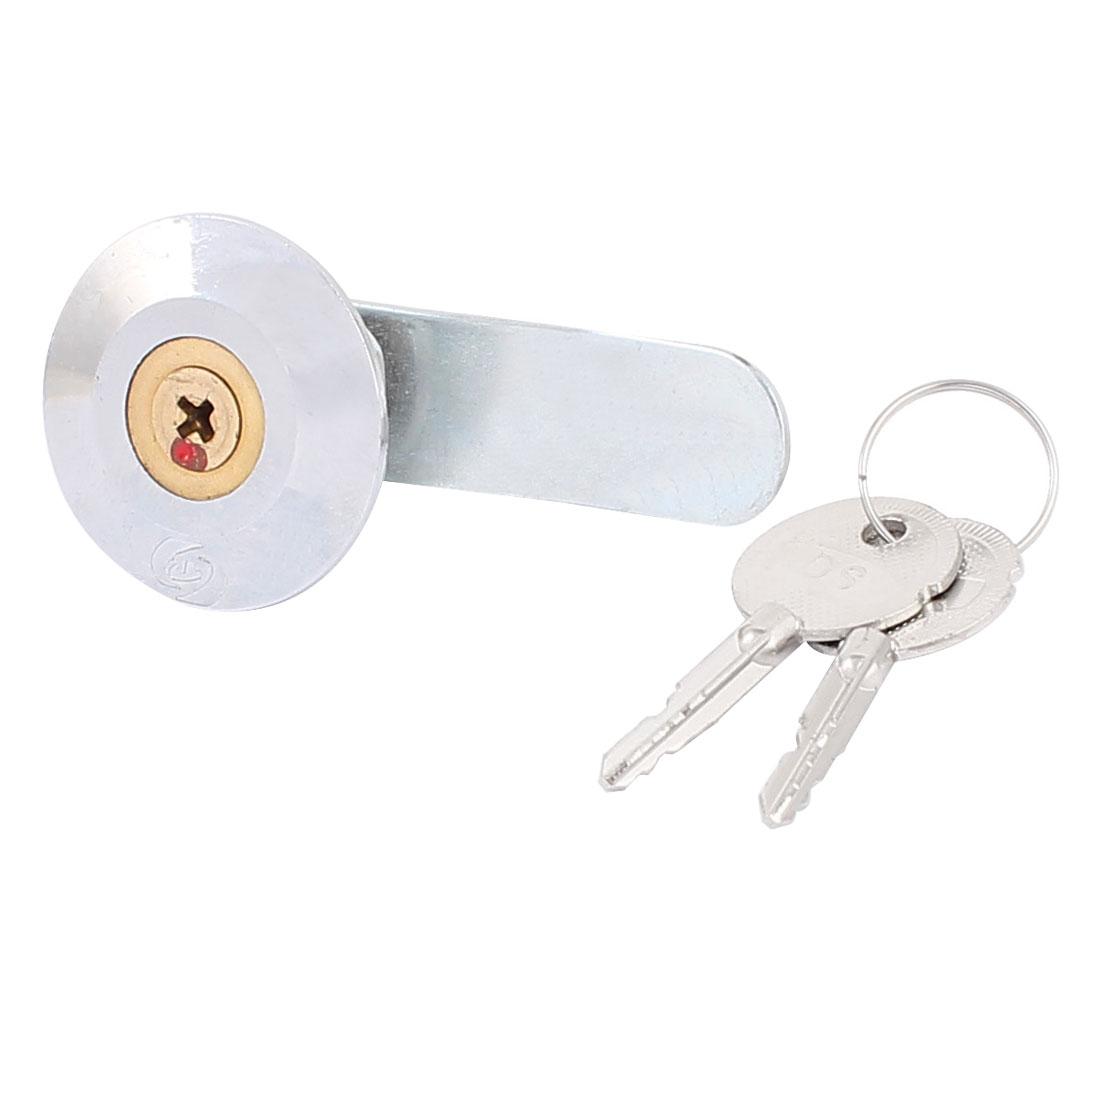 Display Cabinet Electrical Box Safety Steel Cross Key Cam Lock w Keys